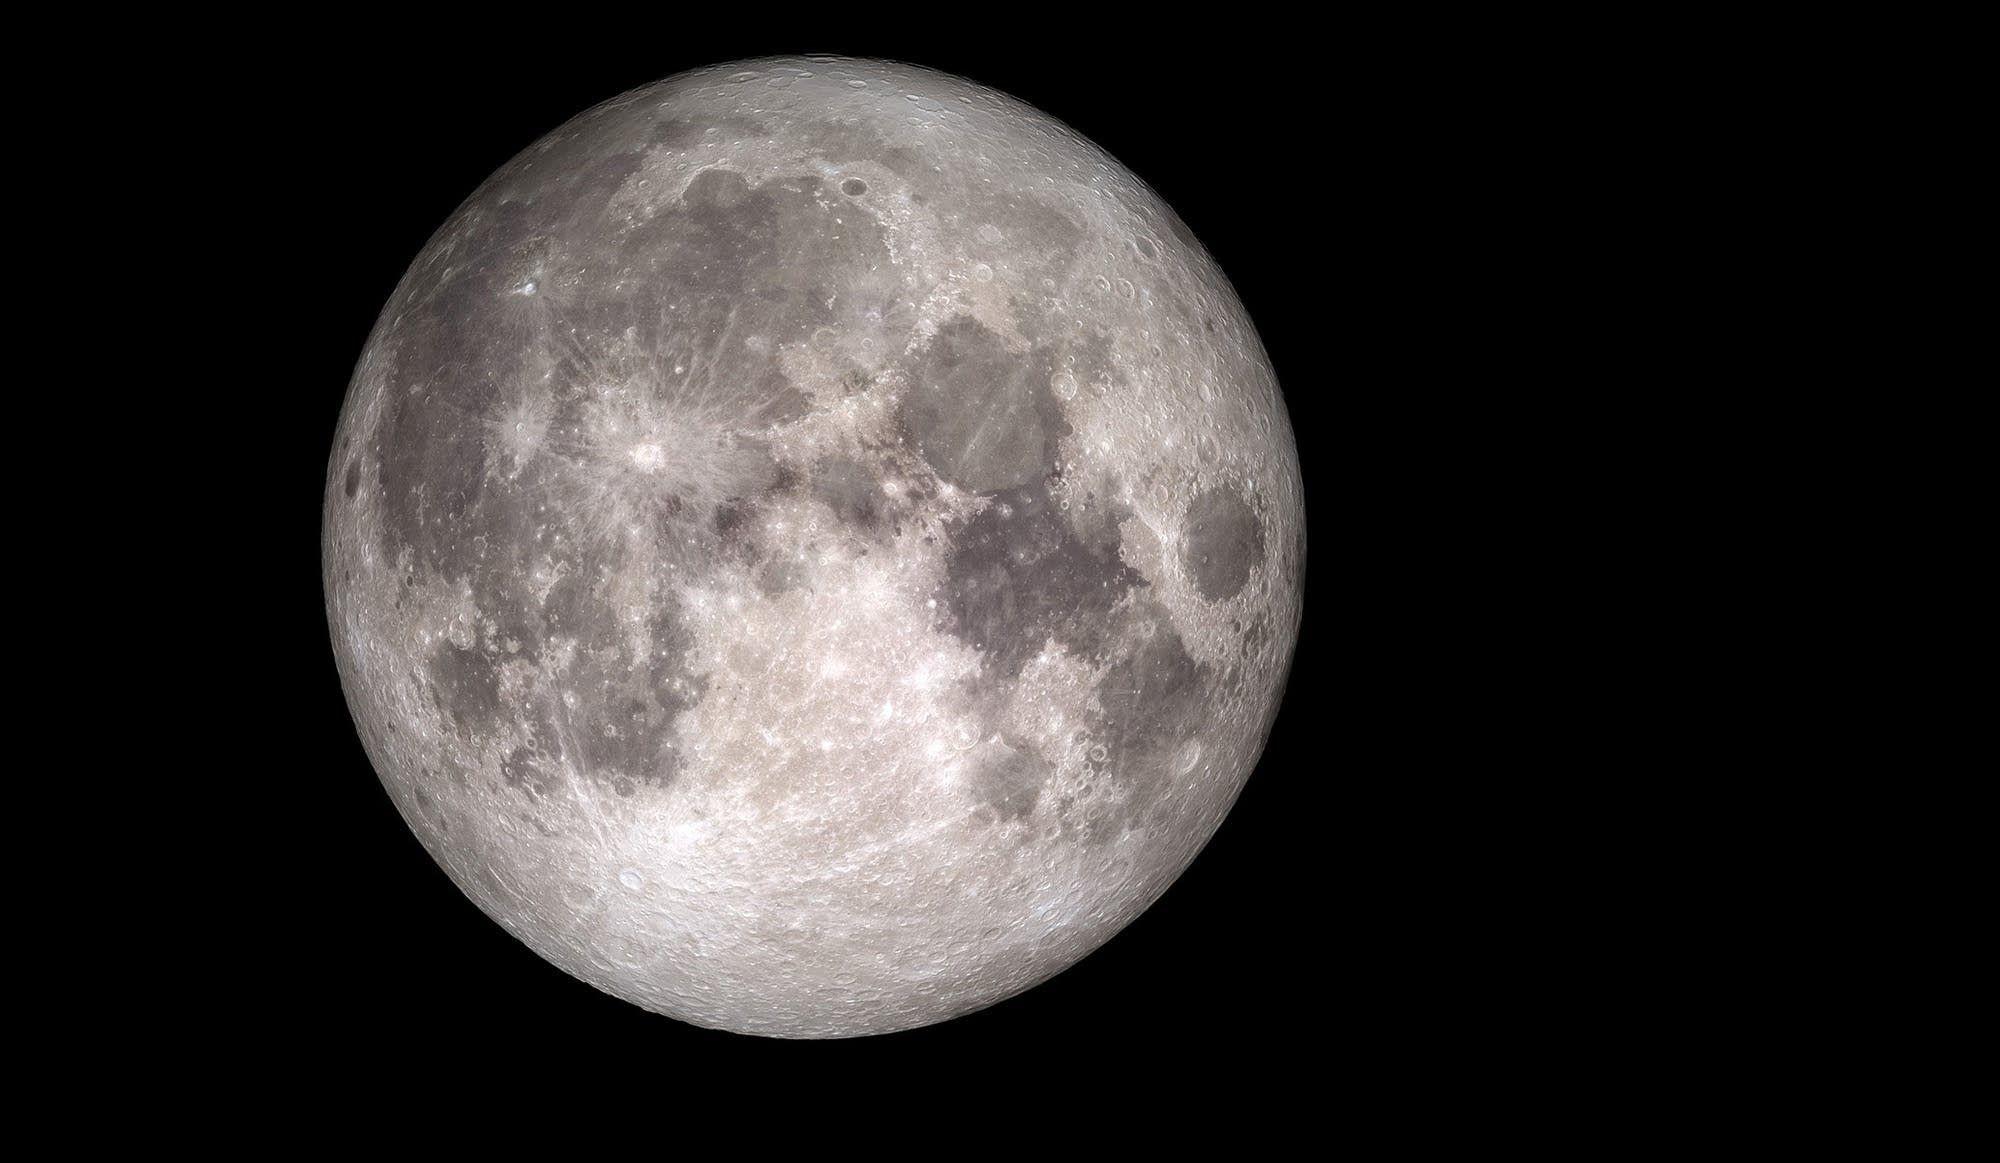 Full Moon Calendar - When Is The Next Full Moon?